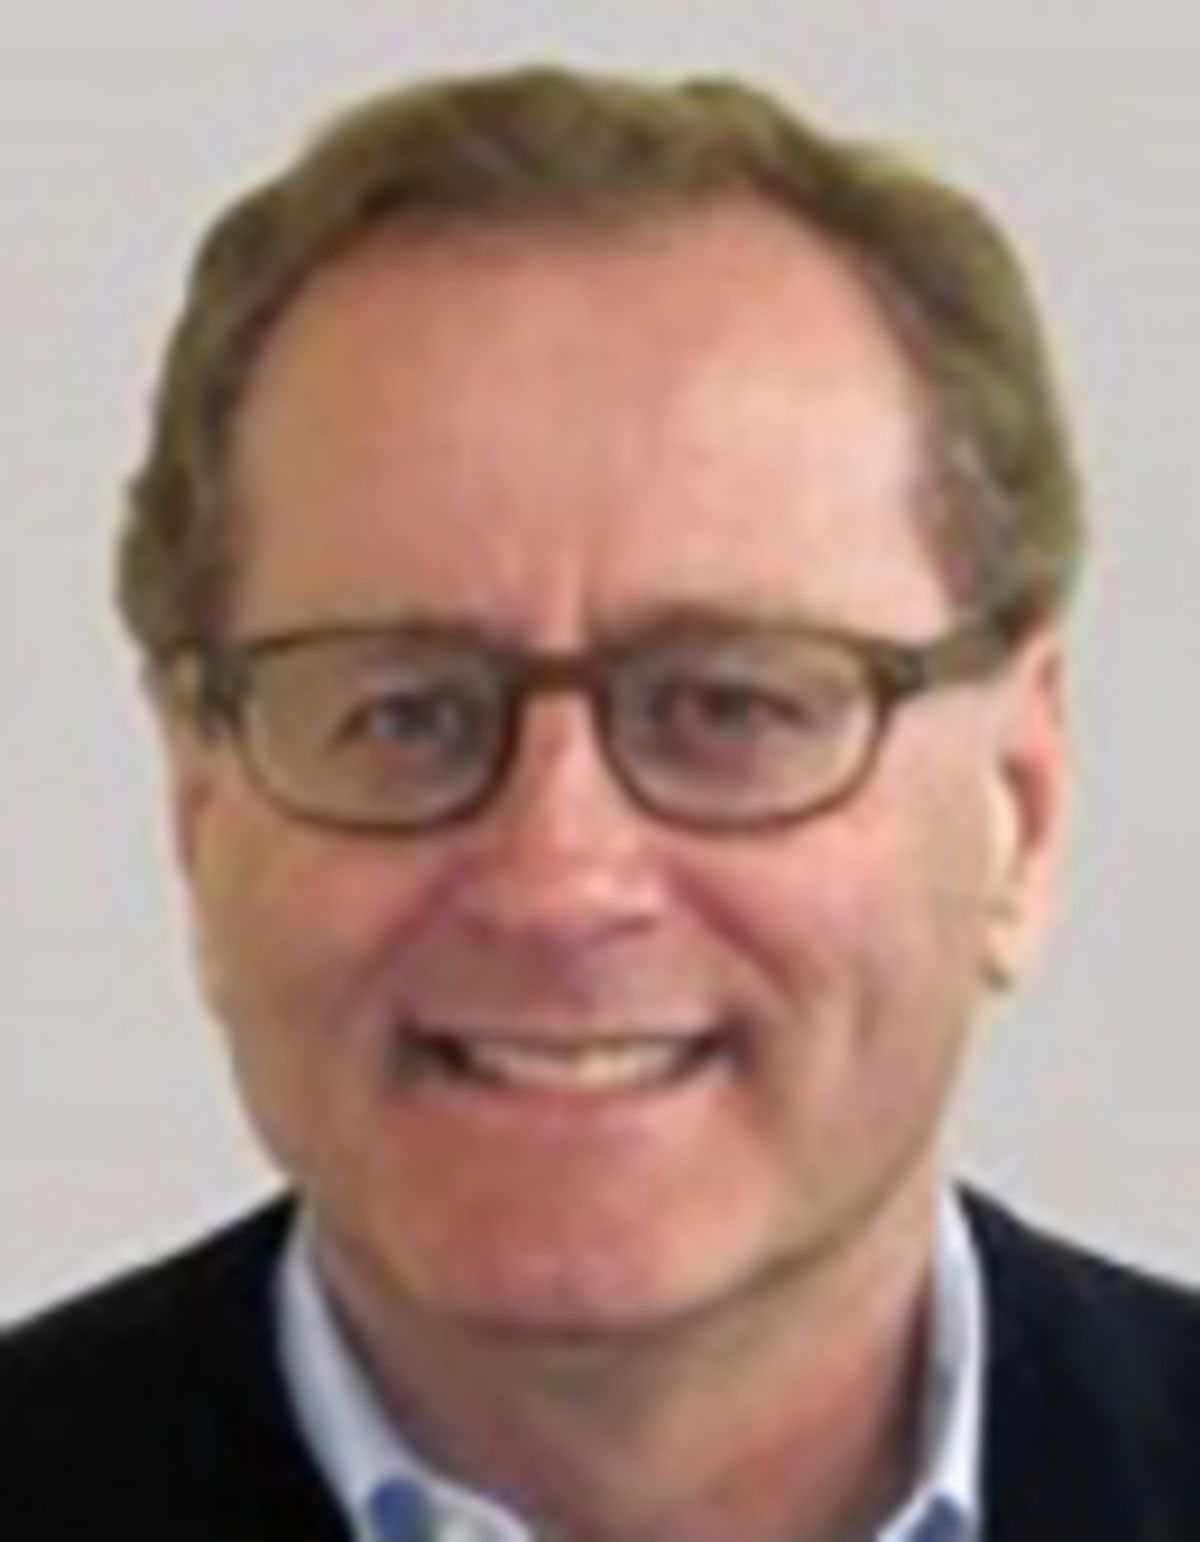 Photo of Richard Harroch, Managing Partner at VantagePoint Capital Partners